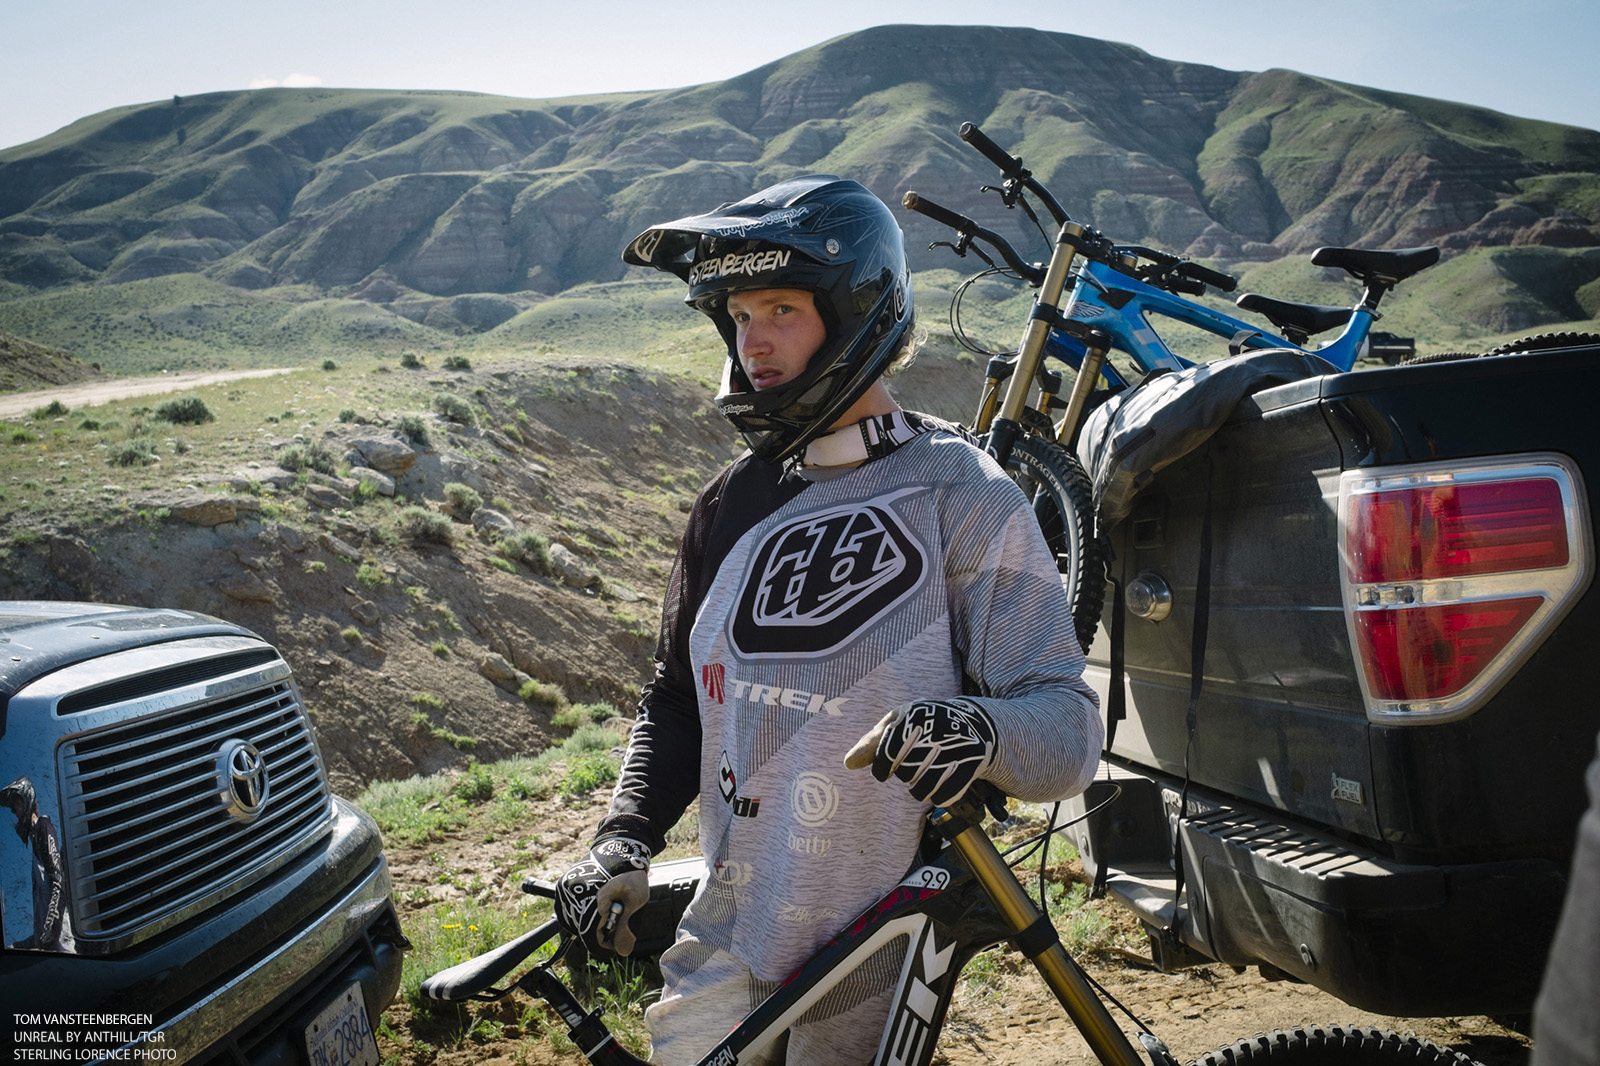 Tom VanSteenbergen successful bid at 70 foot front flip at Turtle Ranch, Wyoming.